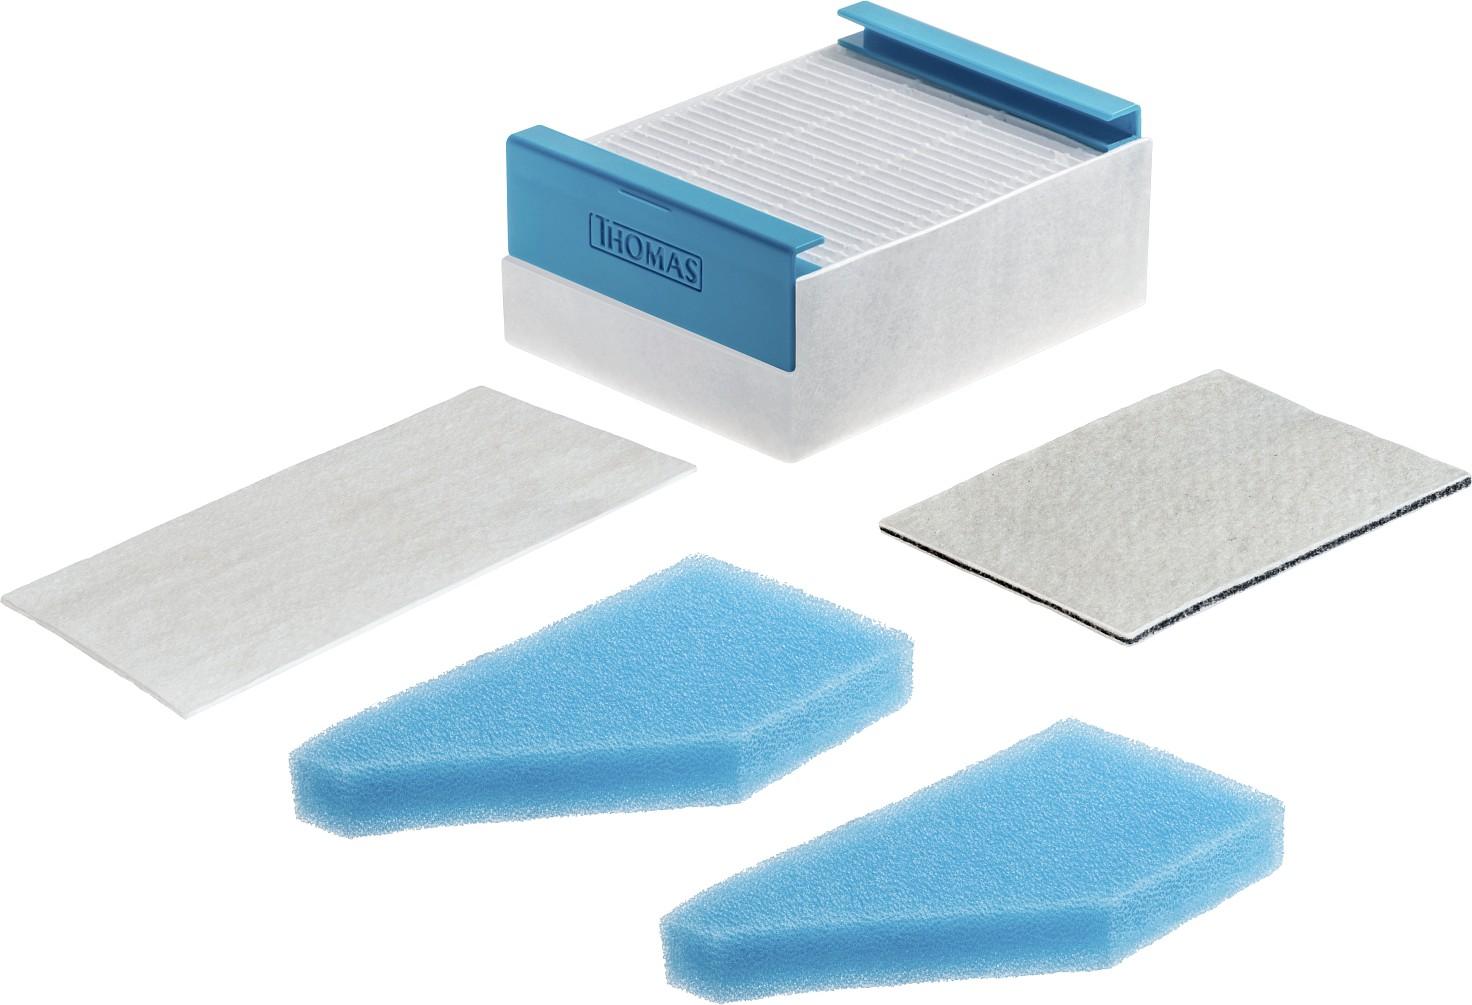 Thomas HEPA 13 Pollenschutz-Filtersystem mit Aktivkohlefilter